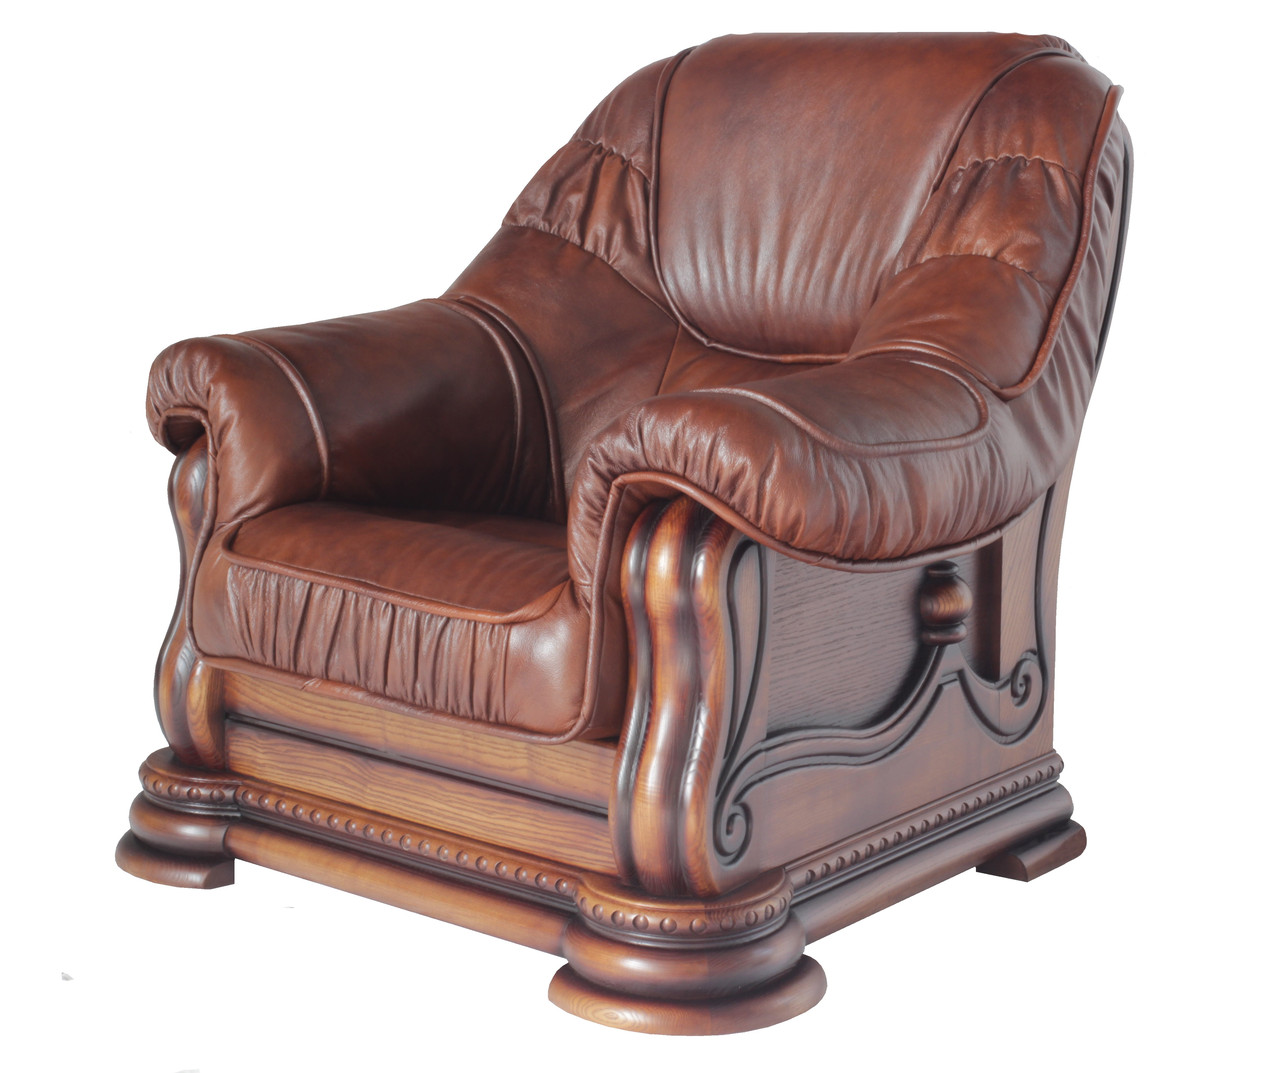 "Класичне шкіряне крісло ""Grizly lite"" (Грізлі лайт)"